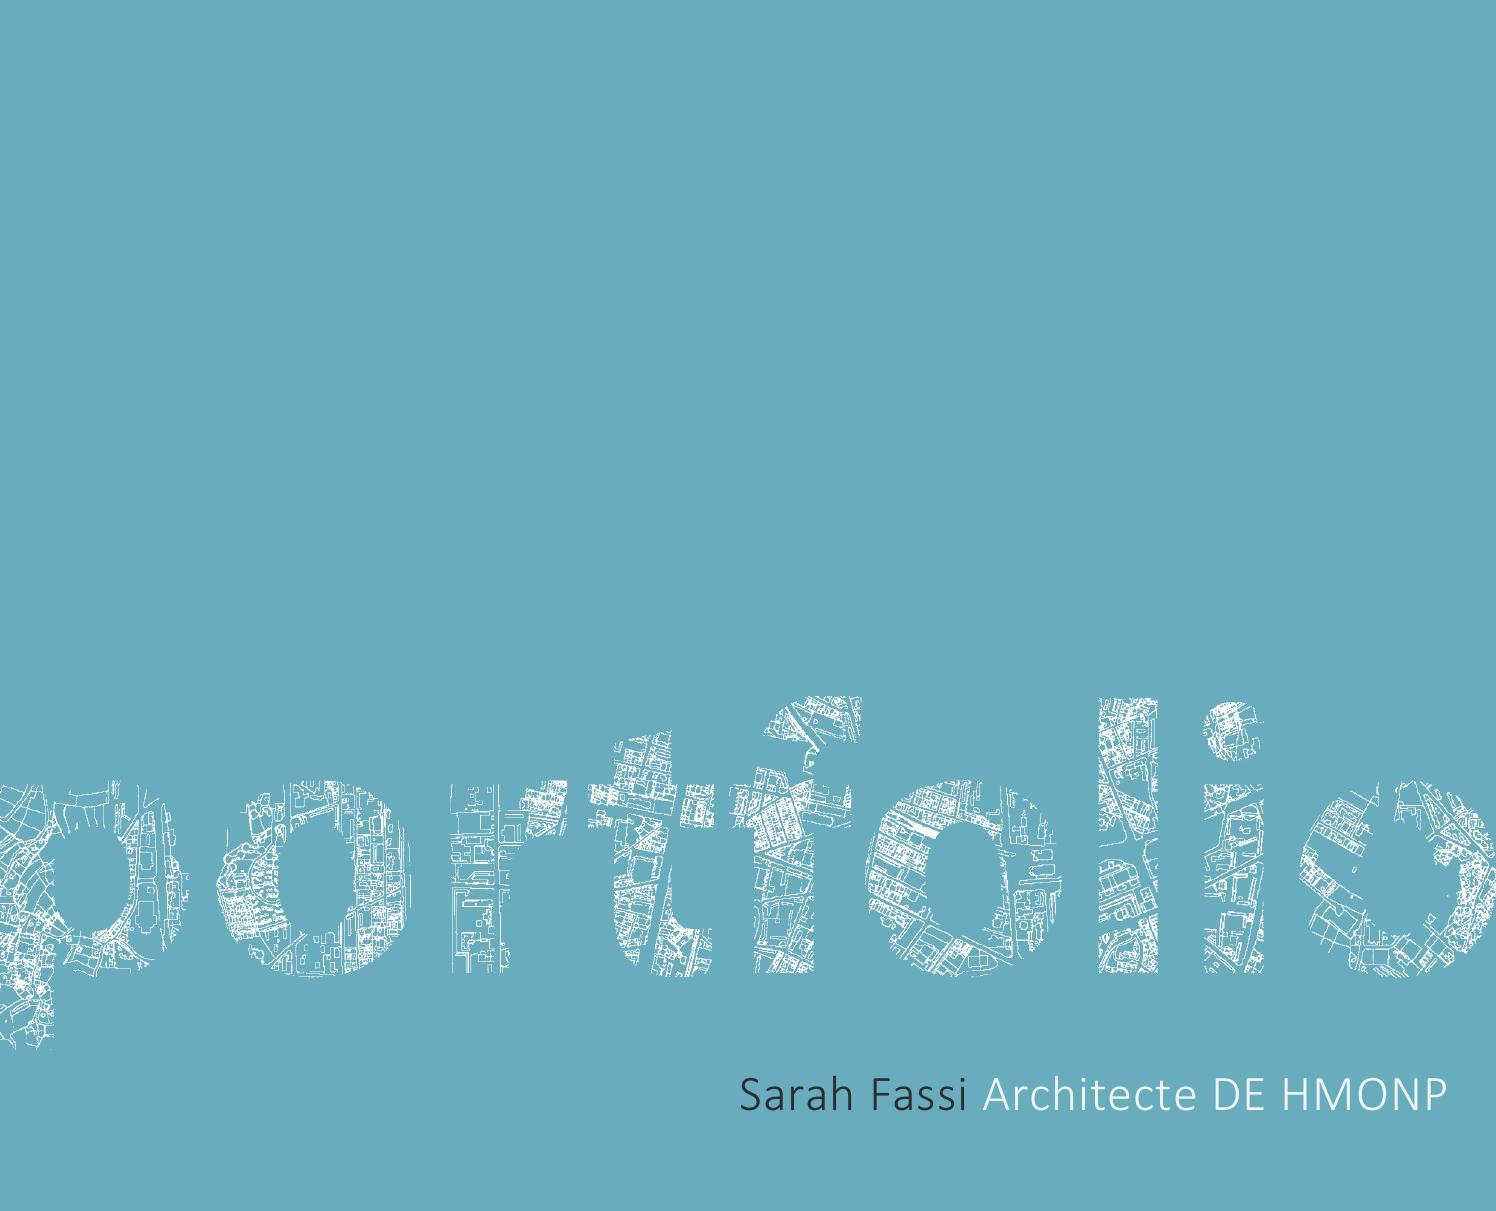 portfolio sarah fassi architecte de hmonp by sarah fassi